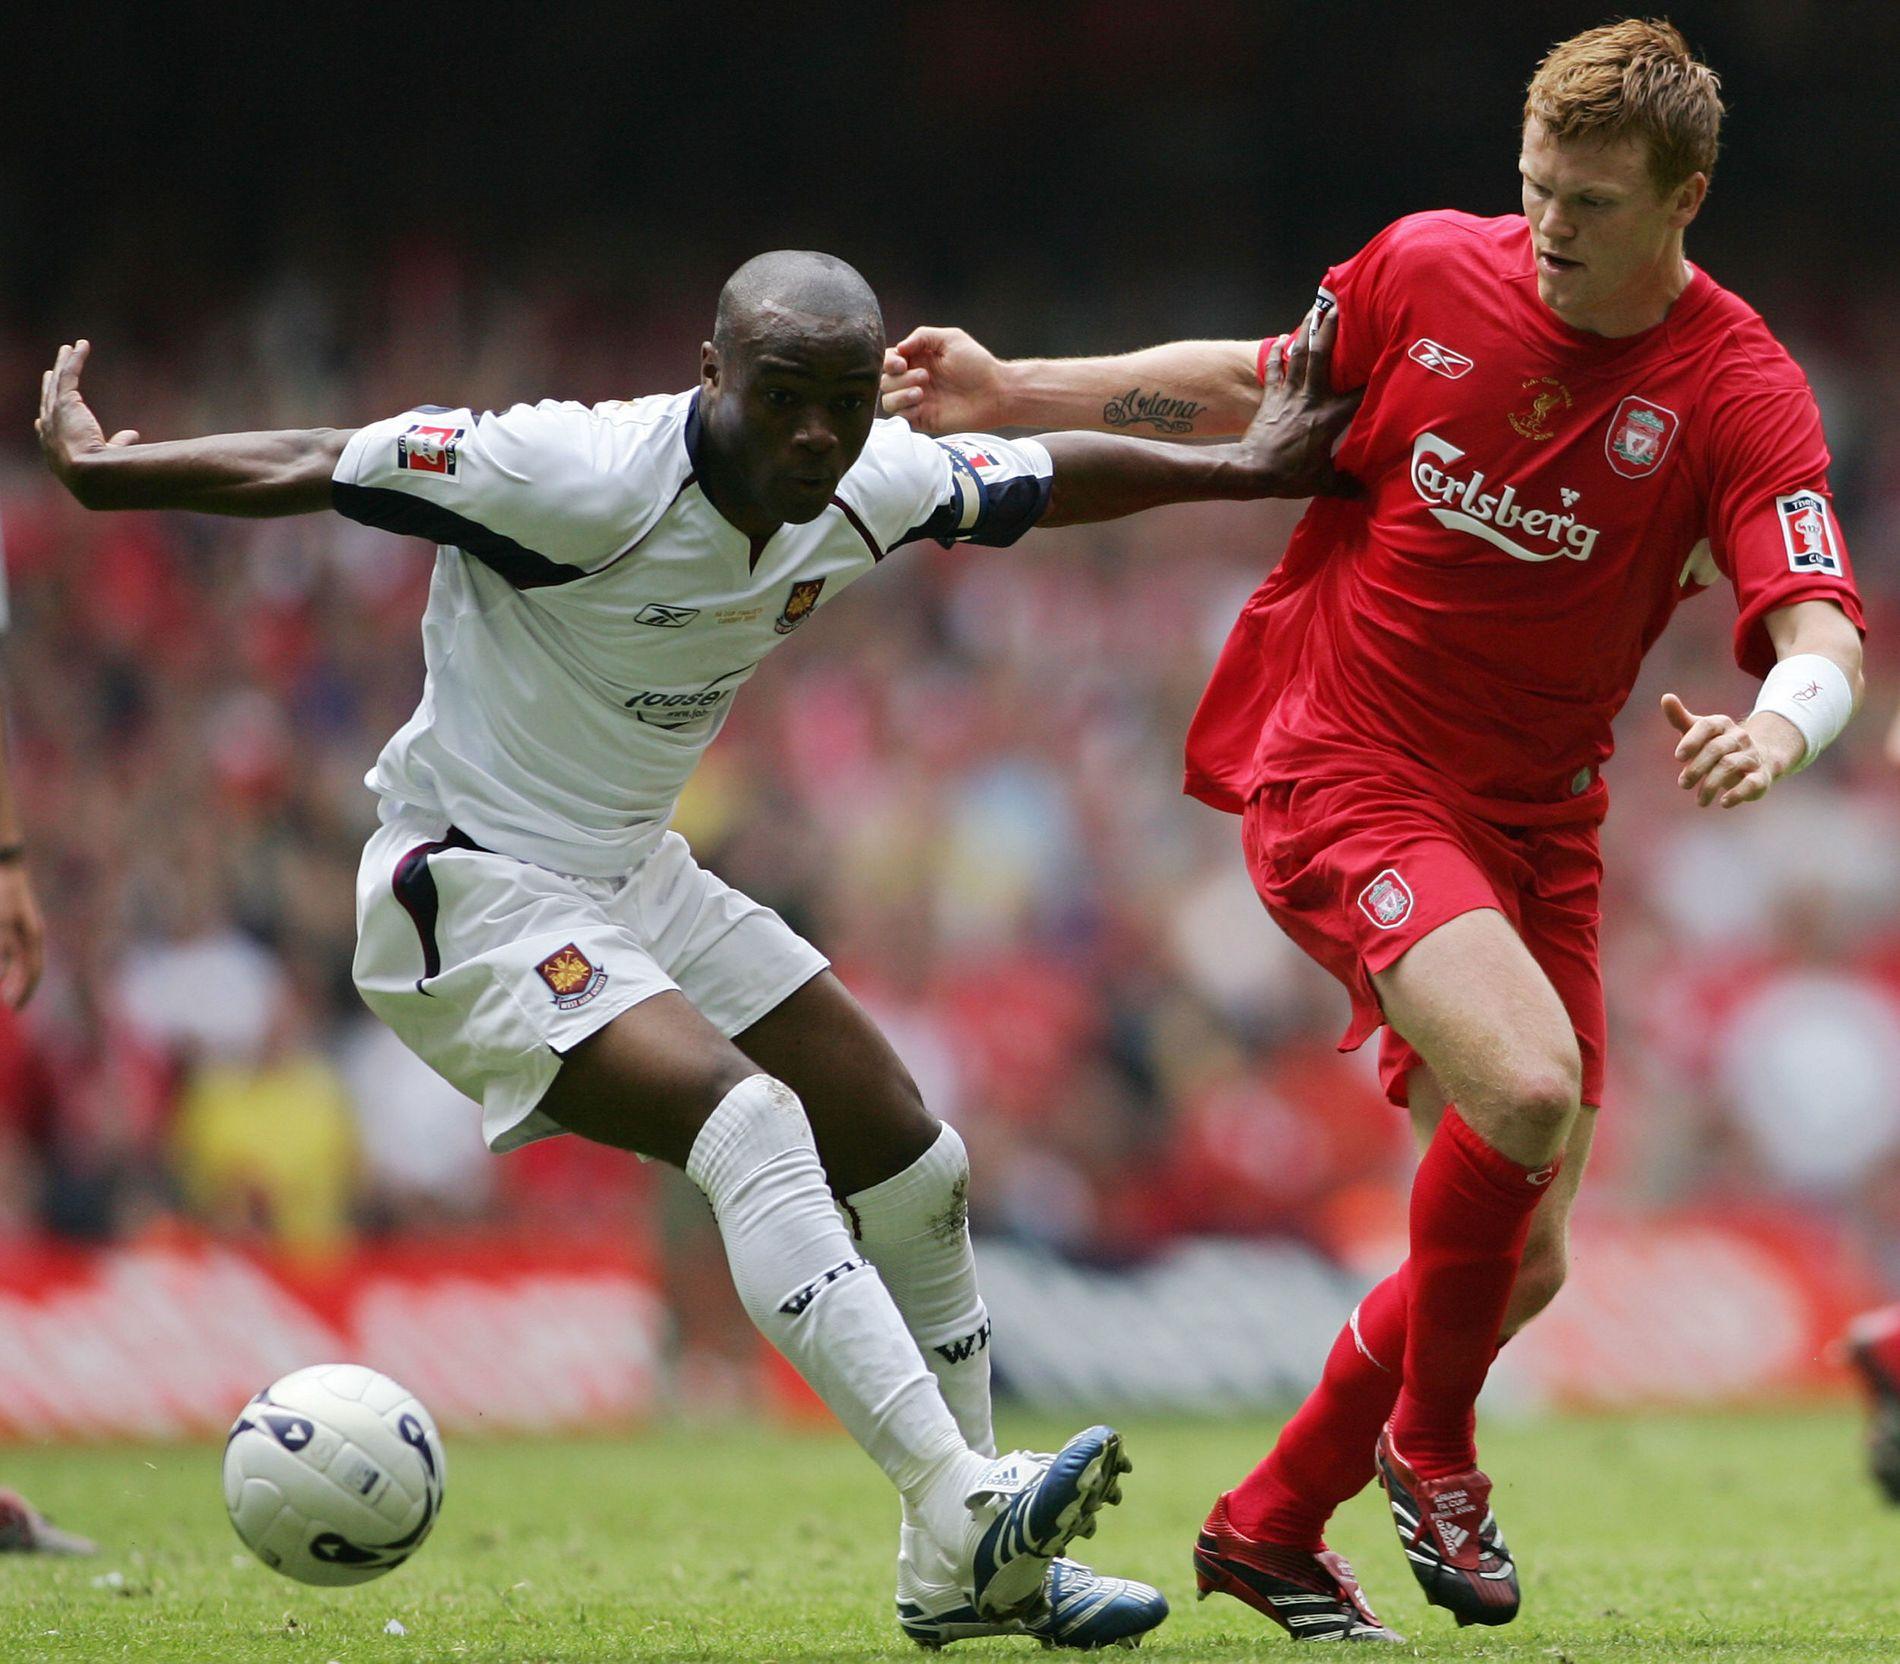 AKTUELL FOR LSK: West Ham-kaptein Nigel Reo-Coker holder Liverpools John Arne Riise på en armlengdes avstand under den dramatiske FA-cupfinalen i 2006. Liverpool vant på straffesparkkonkurranse.